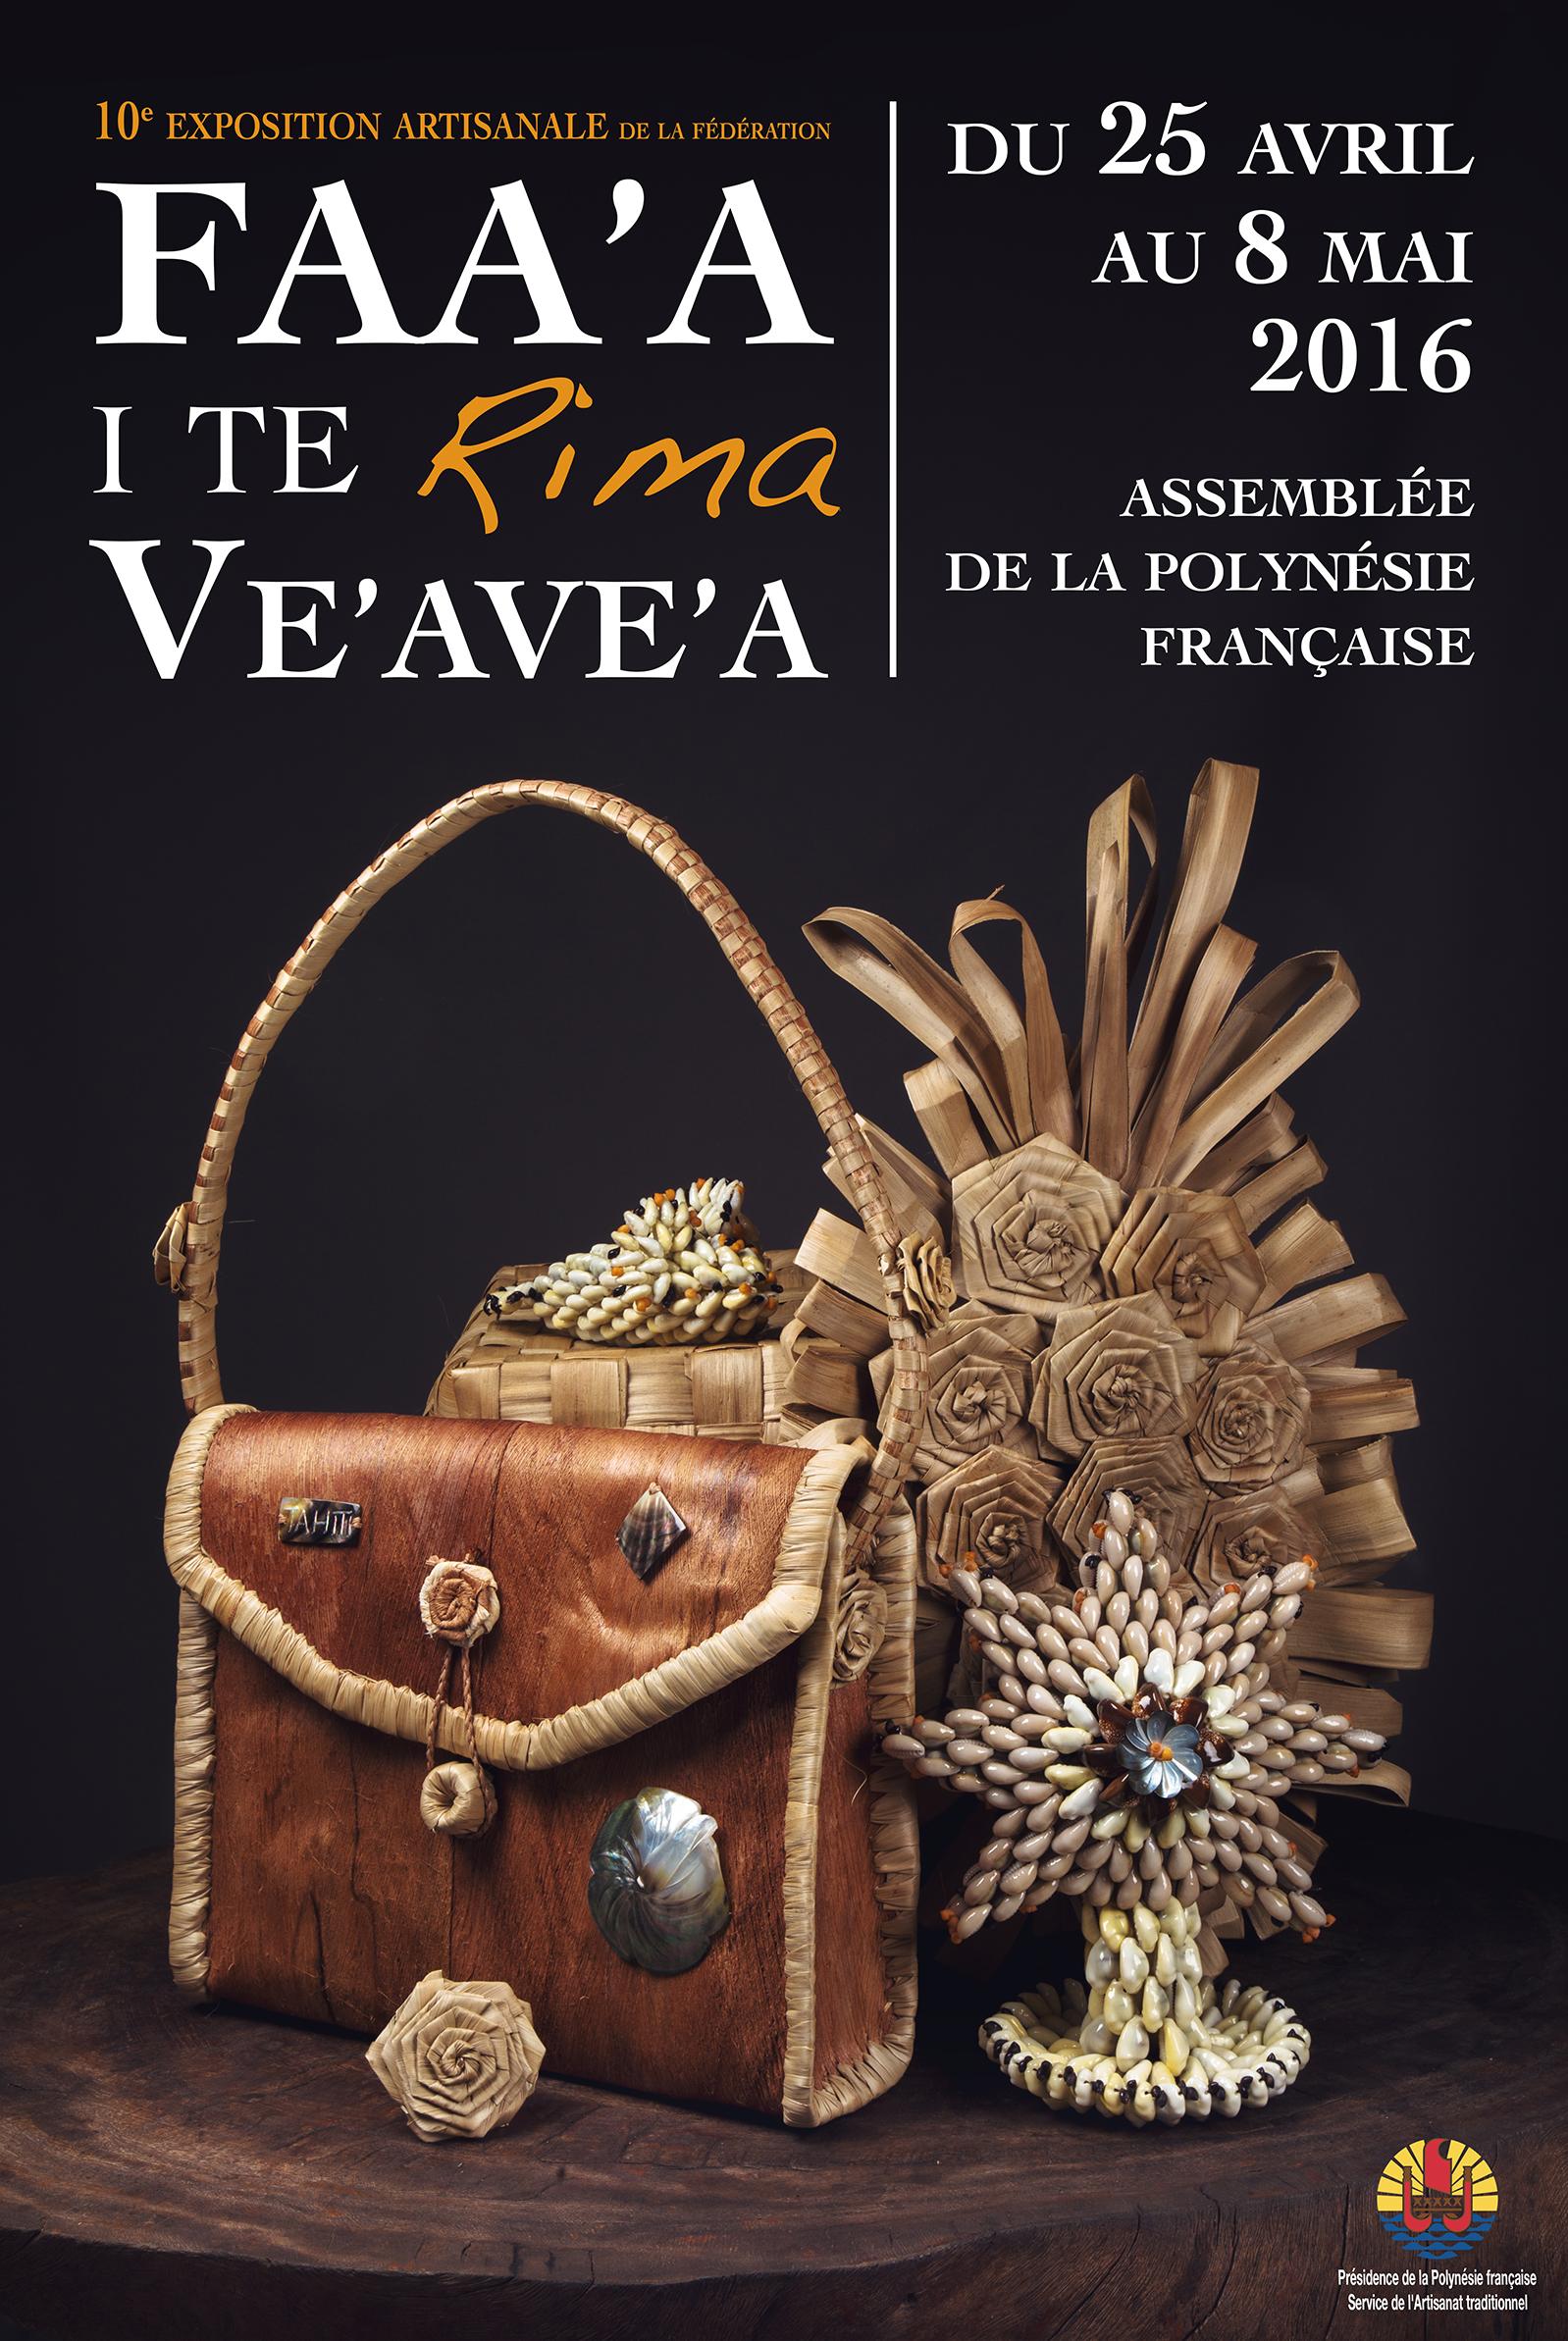 10ème exposition artisanale Faa'a I te Rima Ve'ave'a